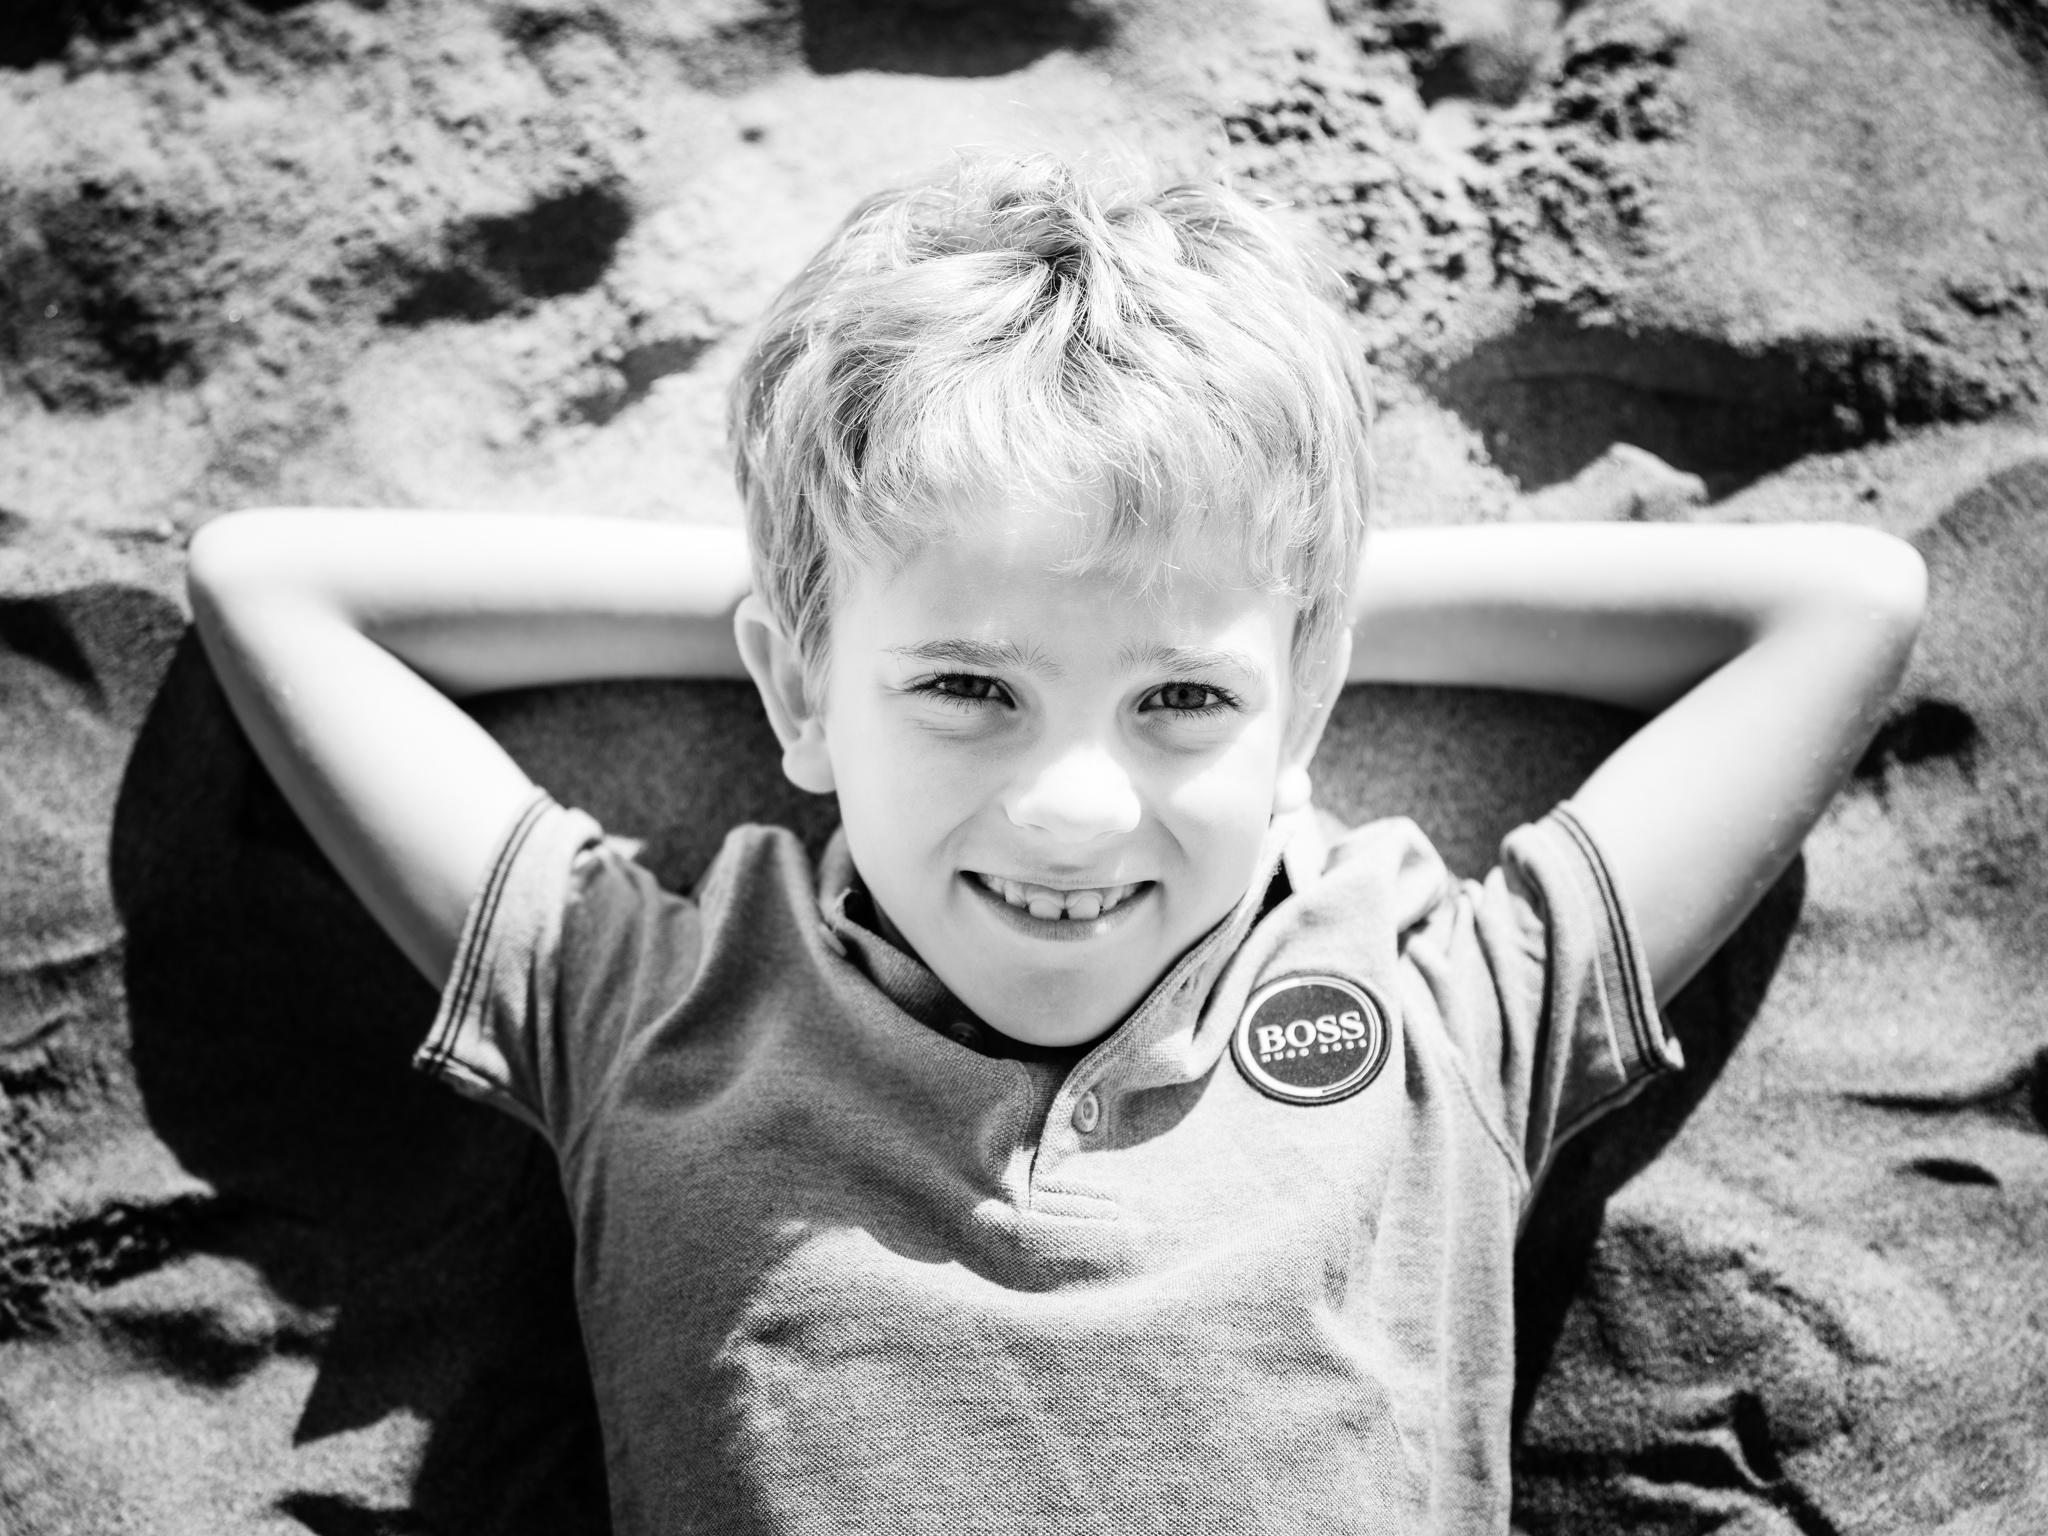 fotografia-infantil-familiar08.jpg